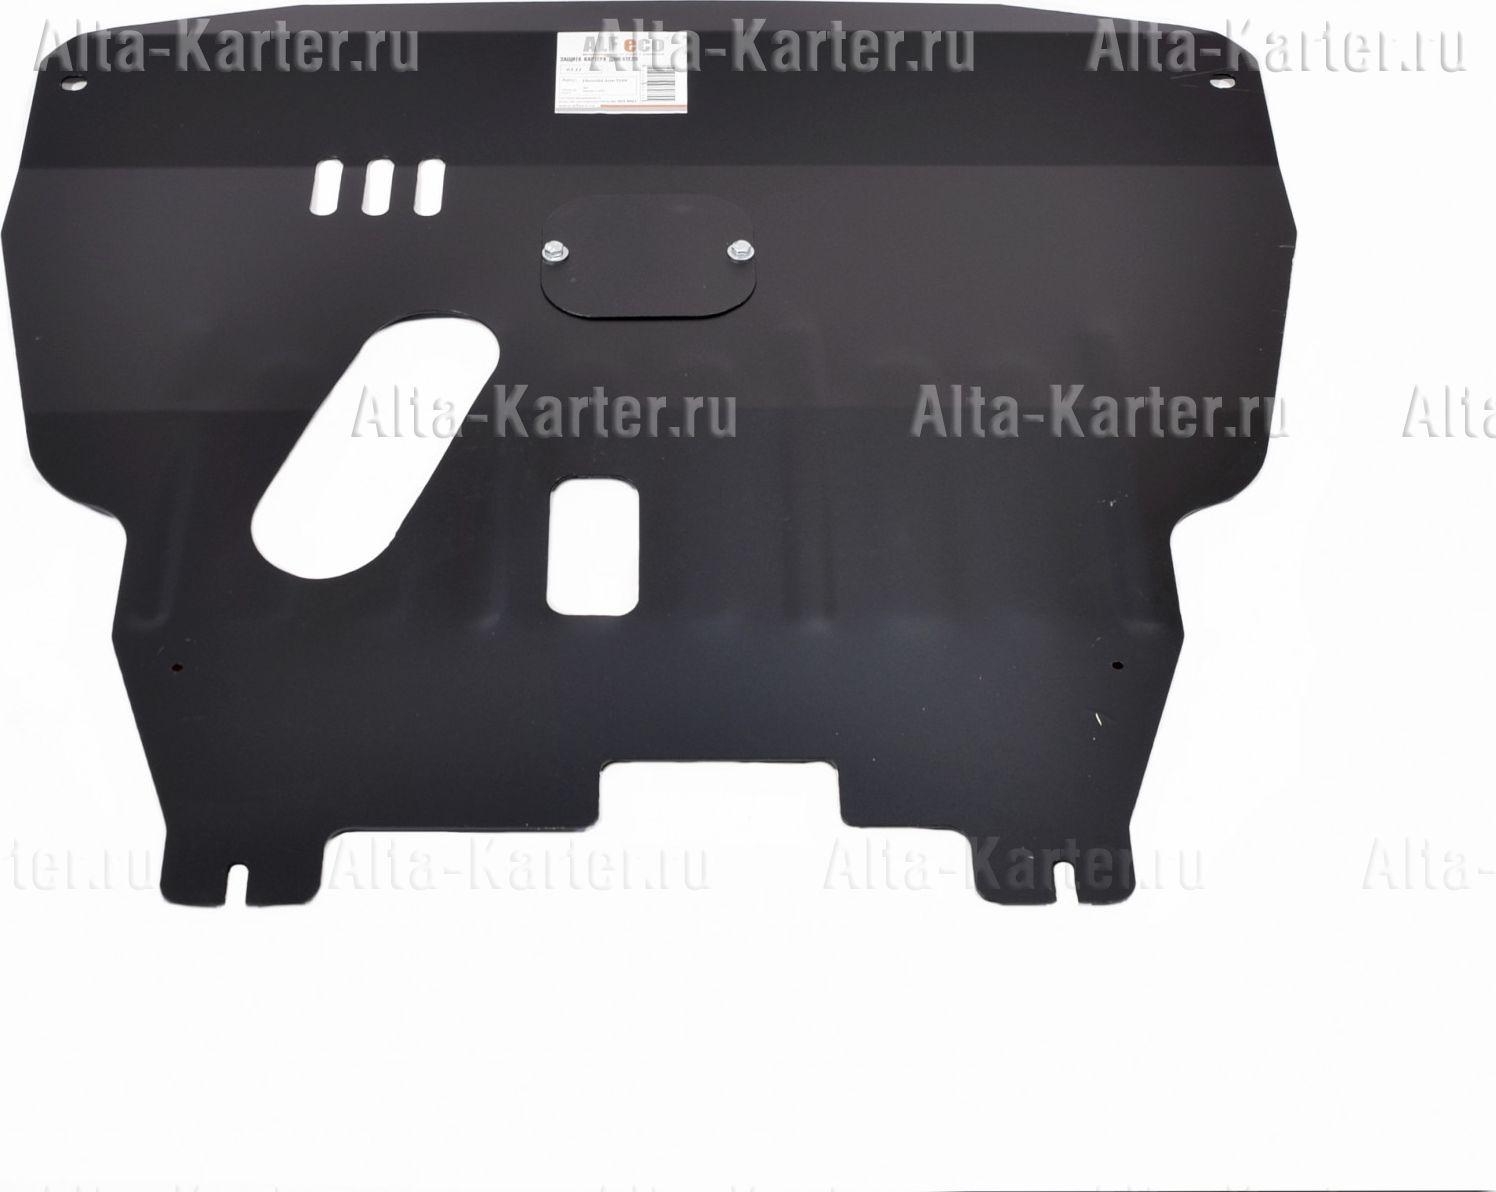 Защита Alfeco для картера и КПП Chevrolet Aveo I T200 2006-2008. Артикул ALF.03.11